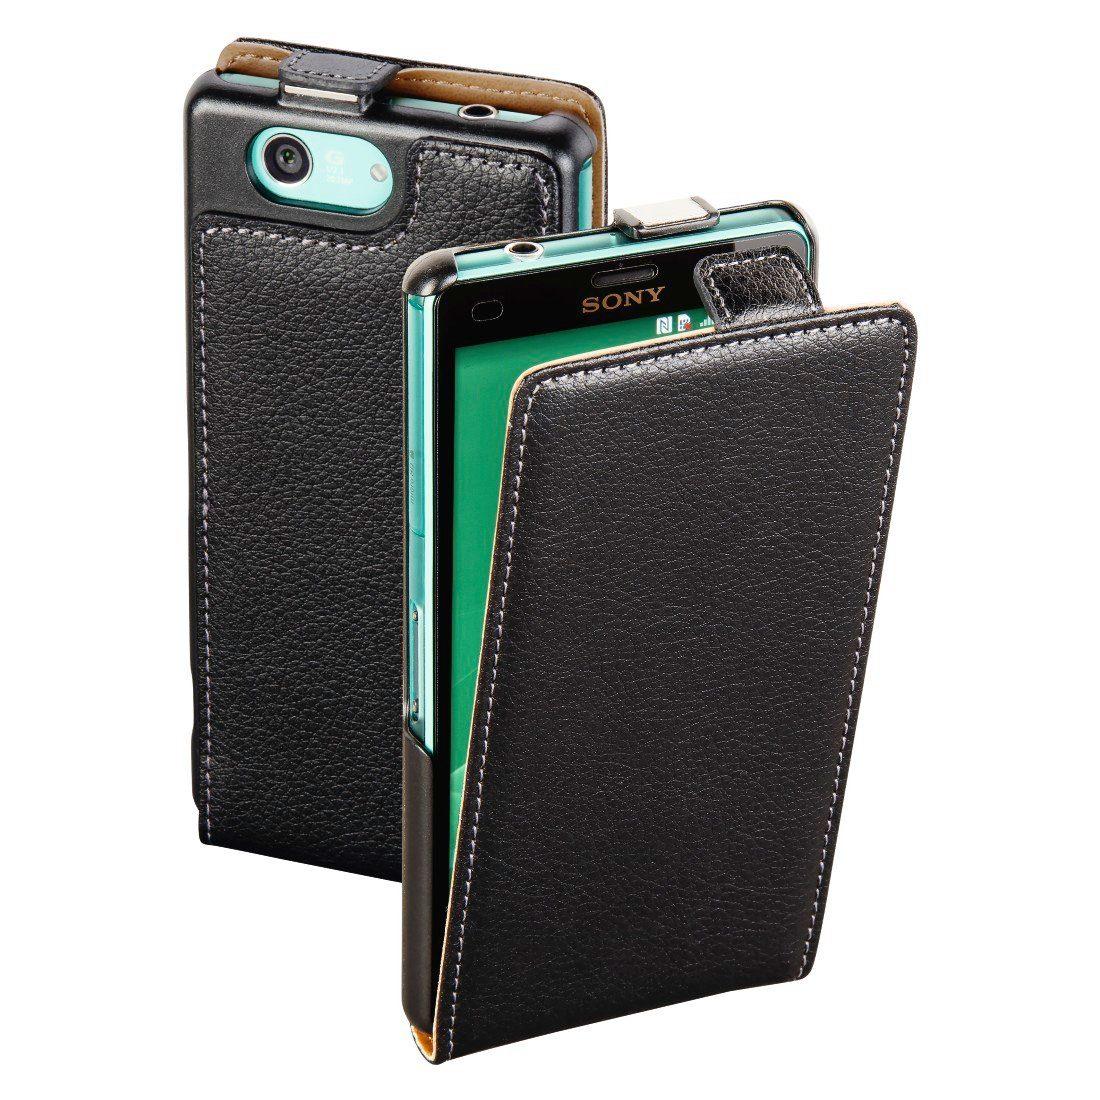 Hama Flap-Tasche Smart Case für Sony Xperia Z3 Compact, Schwarz